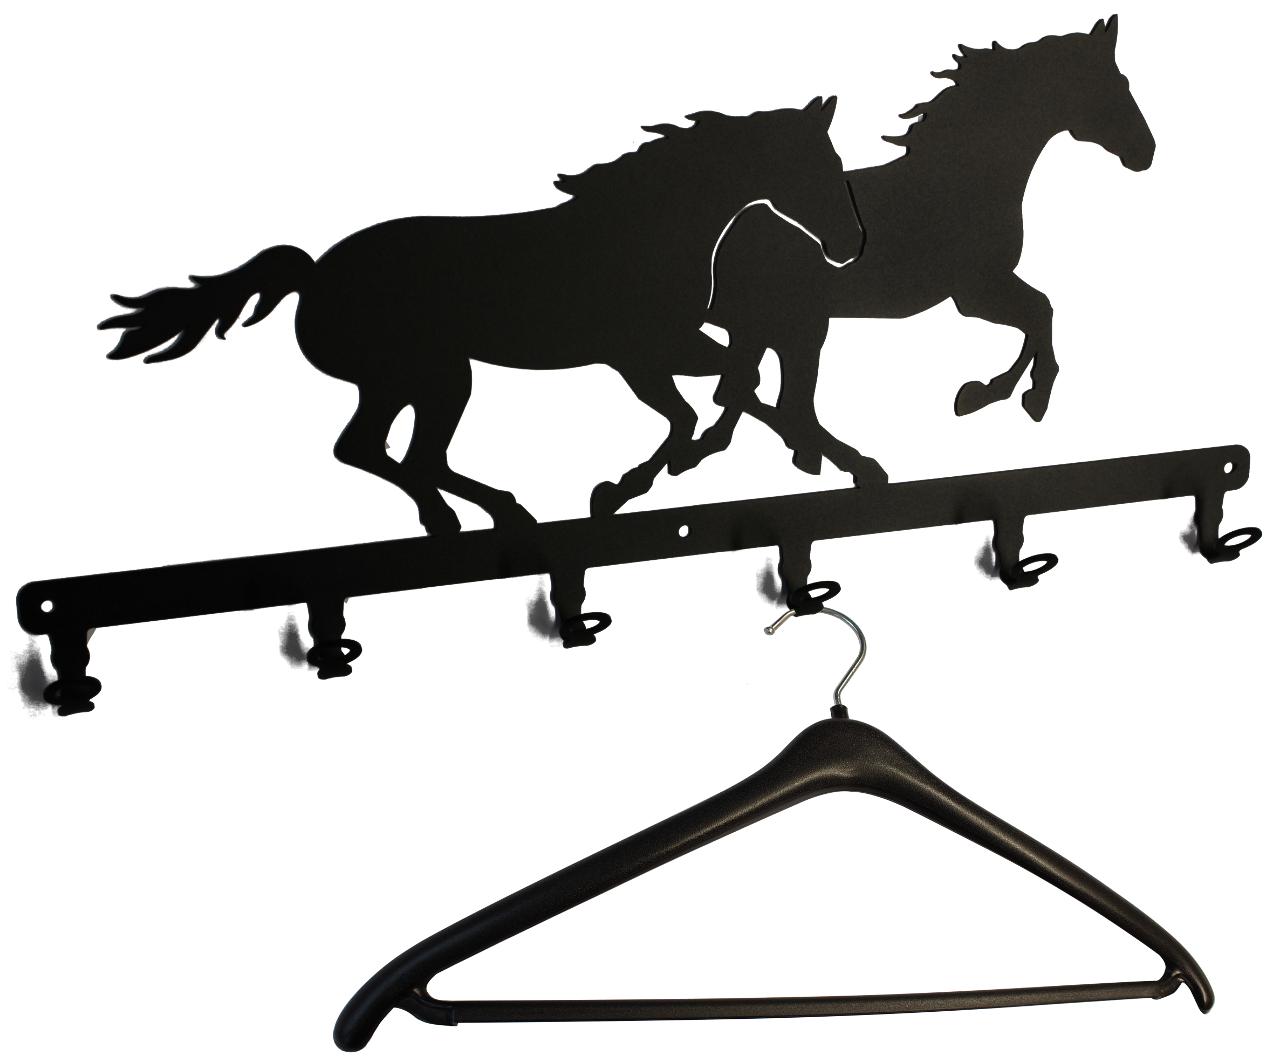 wandgarderobe 2 pferde wandgarderobe schwarz. Black Bedroom Furniture Sets. Home Design Ideas